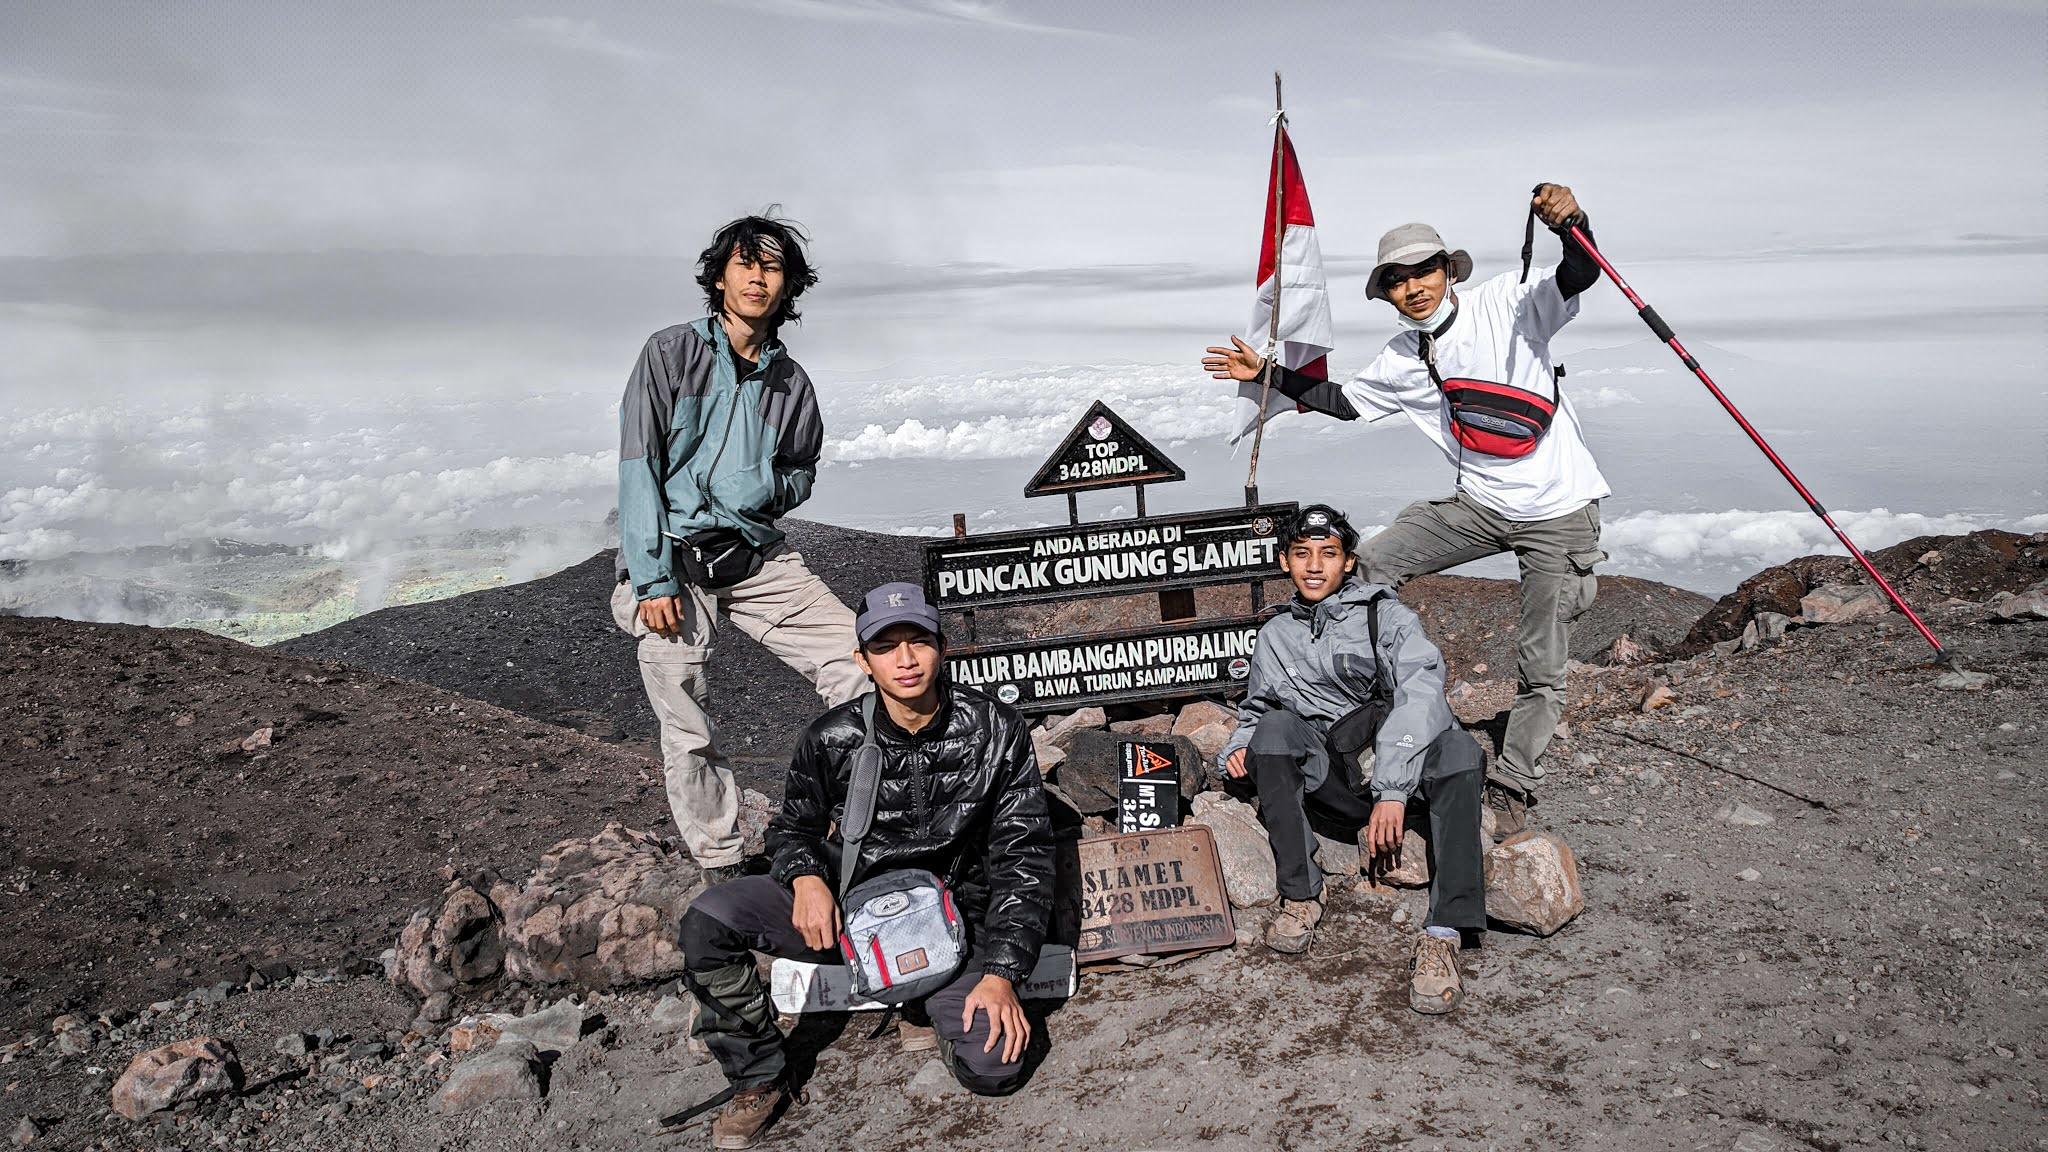 Biaya mendaki gunung slamet 3428mdpl